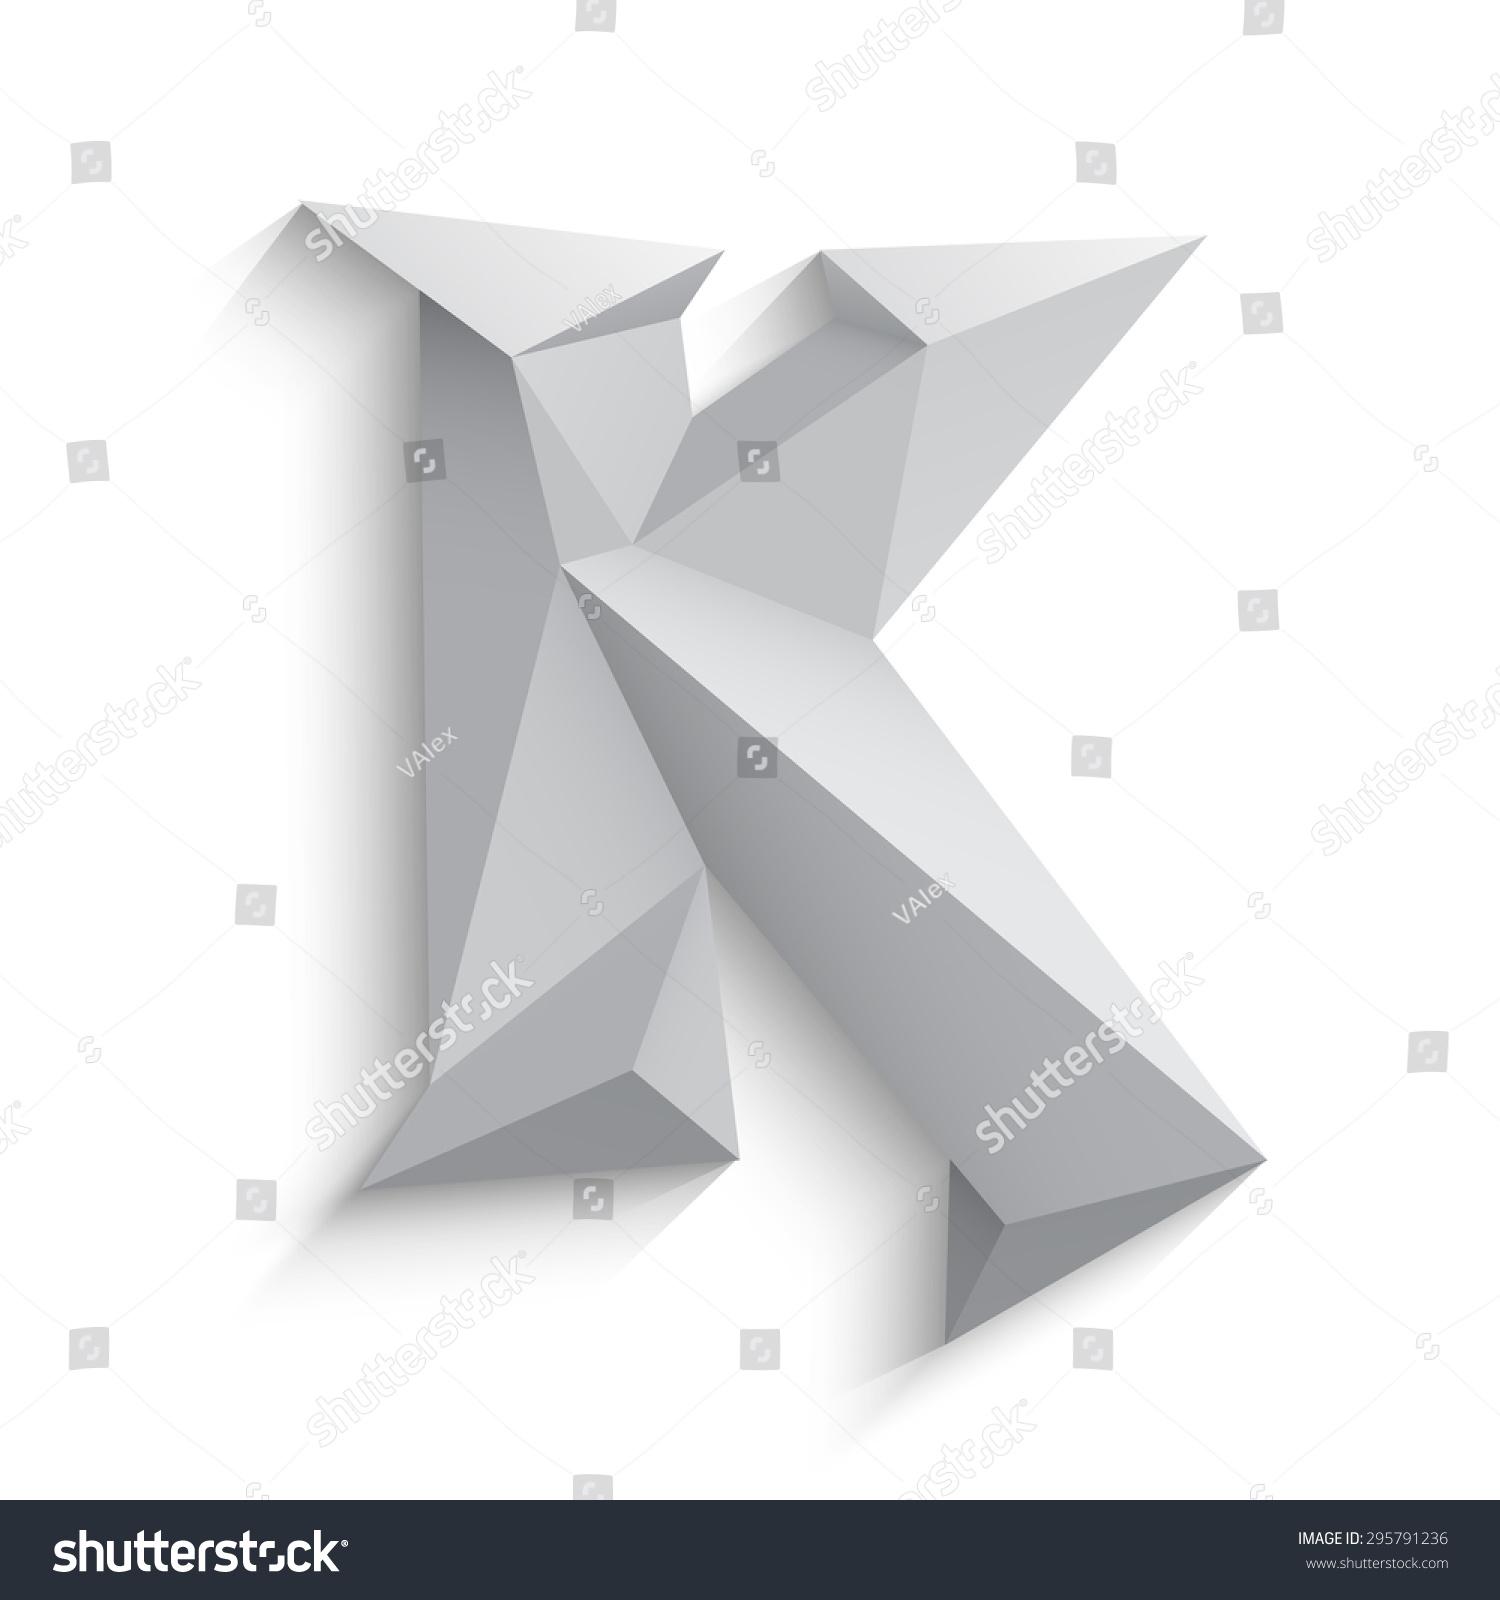 Vector Illustration 3 D Letter K On Stock Vector HD (Royalty Free ...